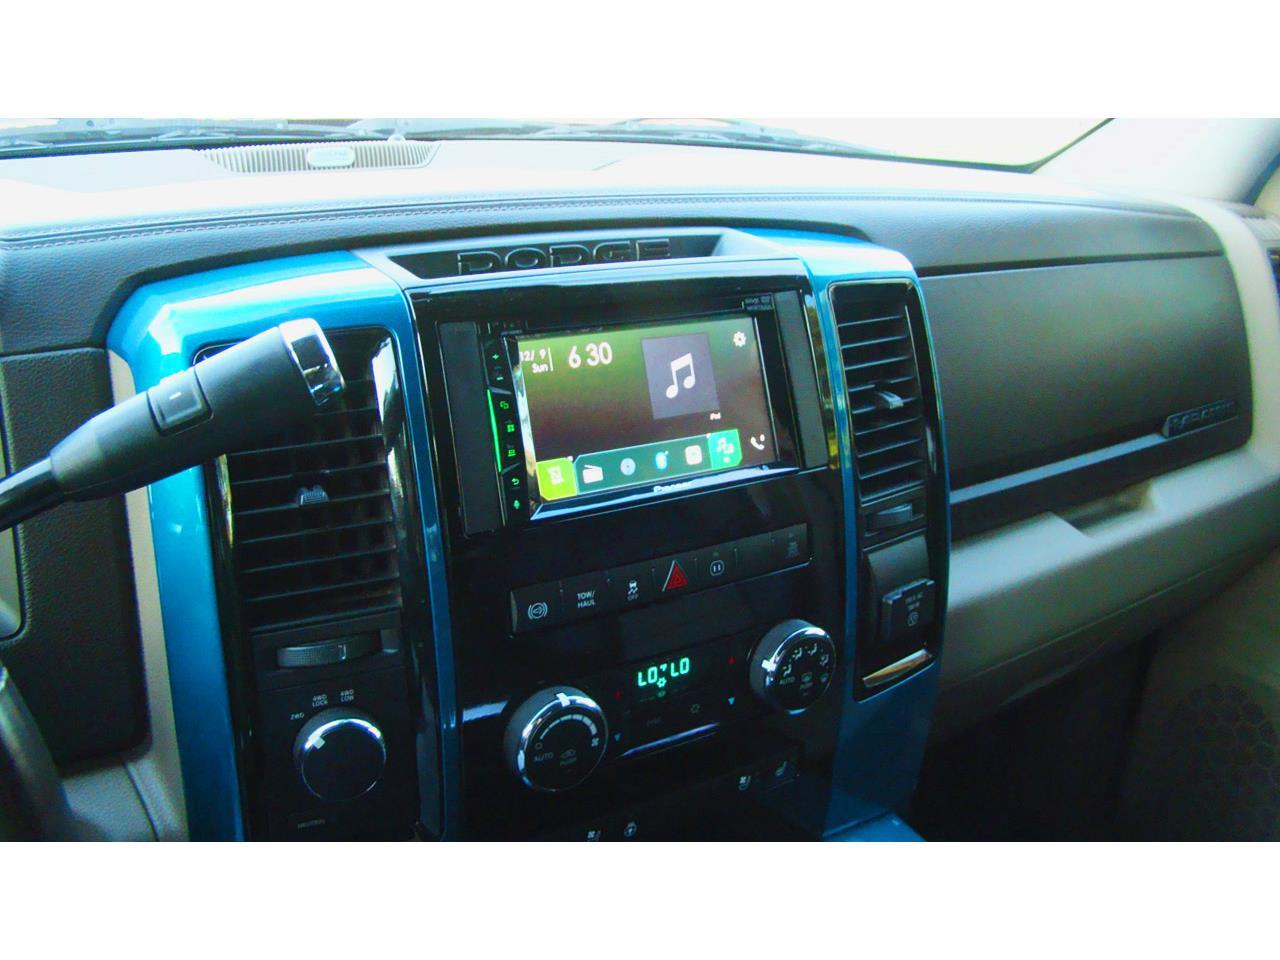 2012 Dodge Ram 2500 (CC-1250660) for sale in Sedona, Arizona